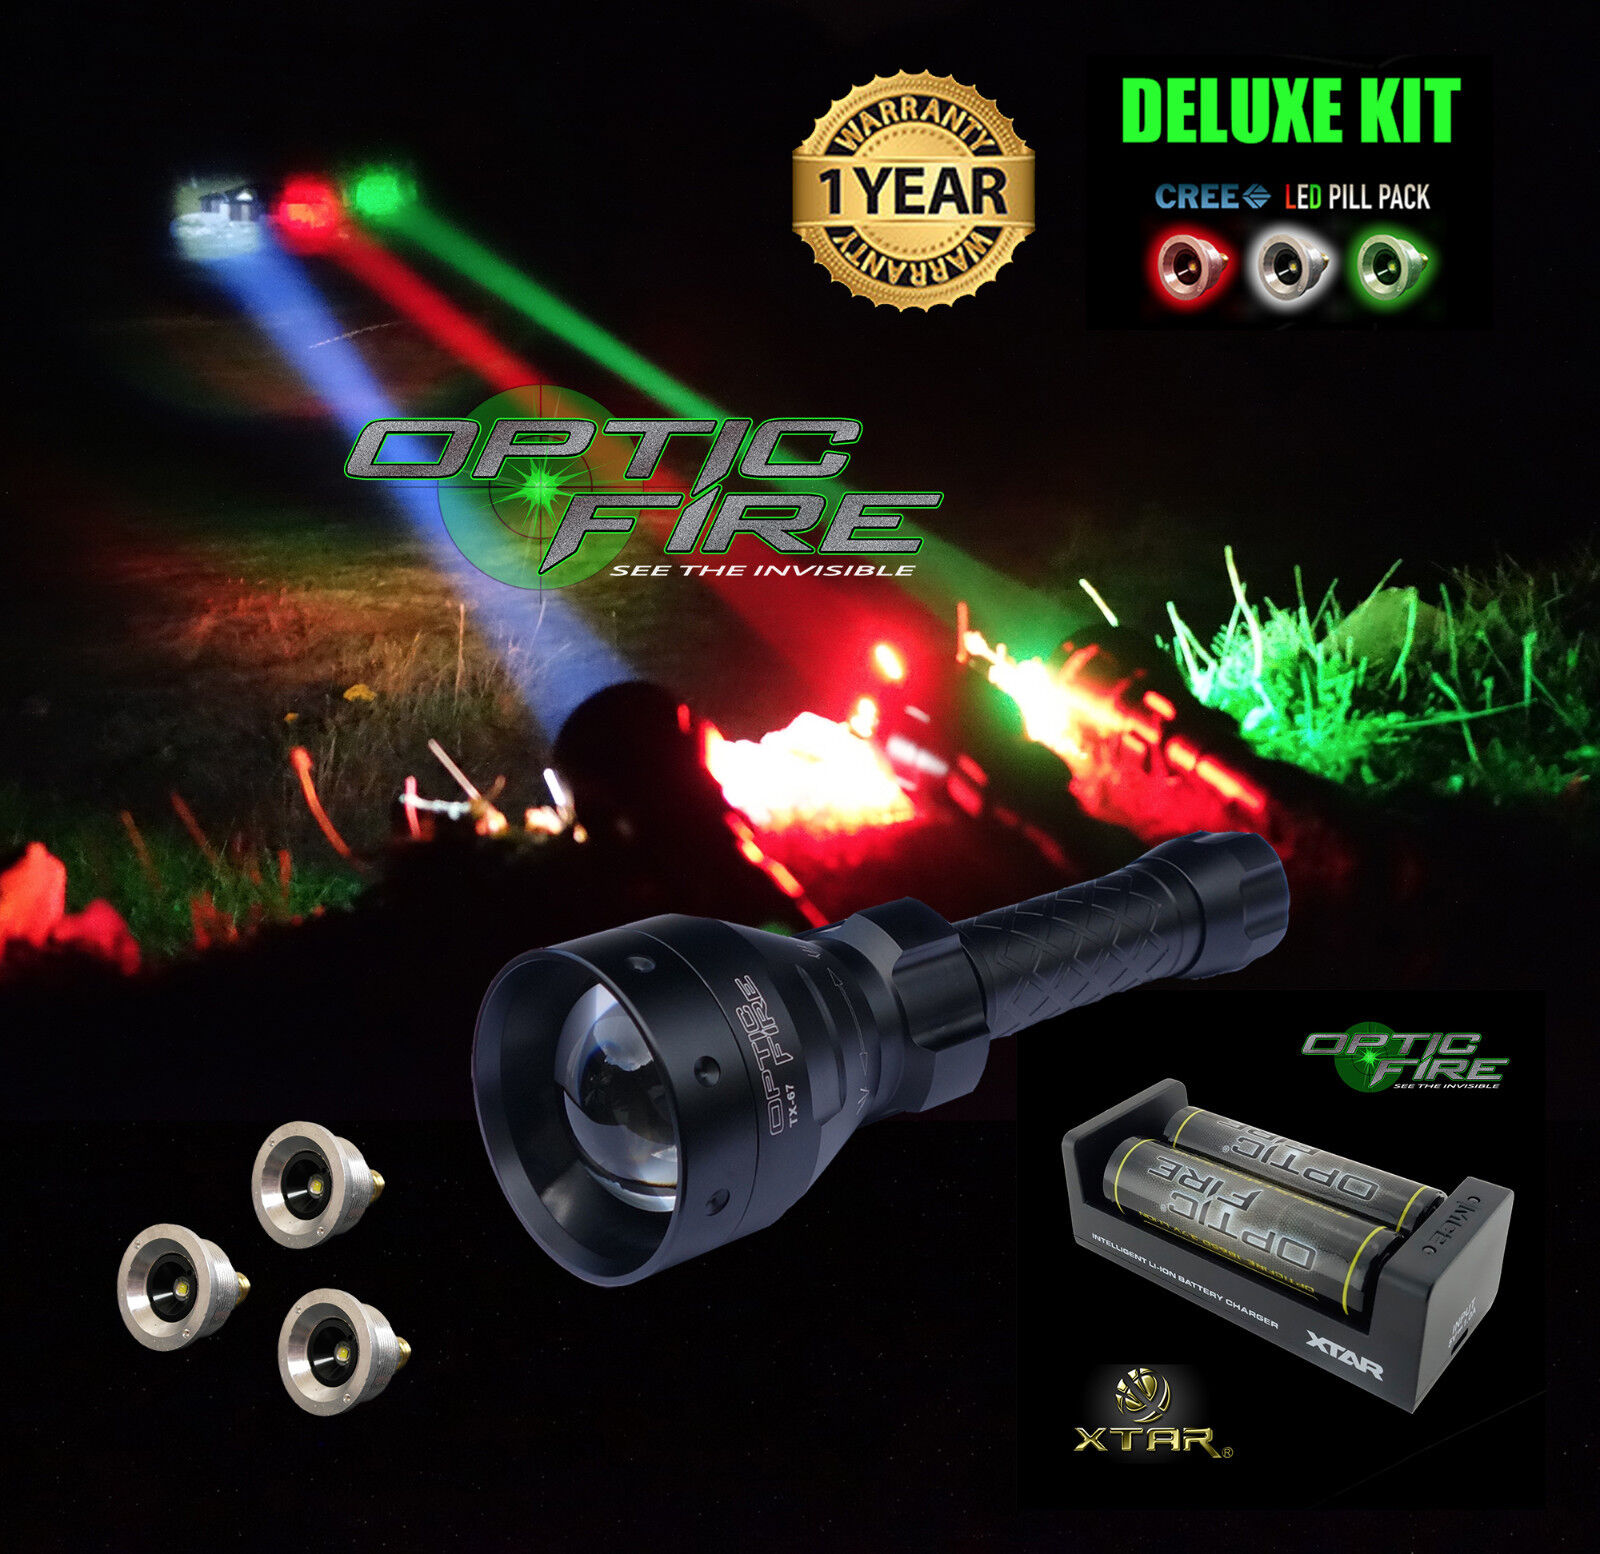 Opticfire® TX-67 T67 LED Deluxe Supreme hunting torch gun light lamp lamping kit